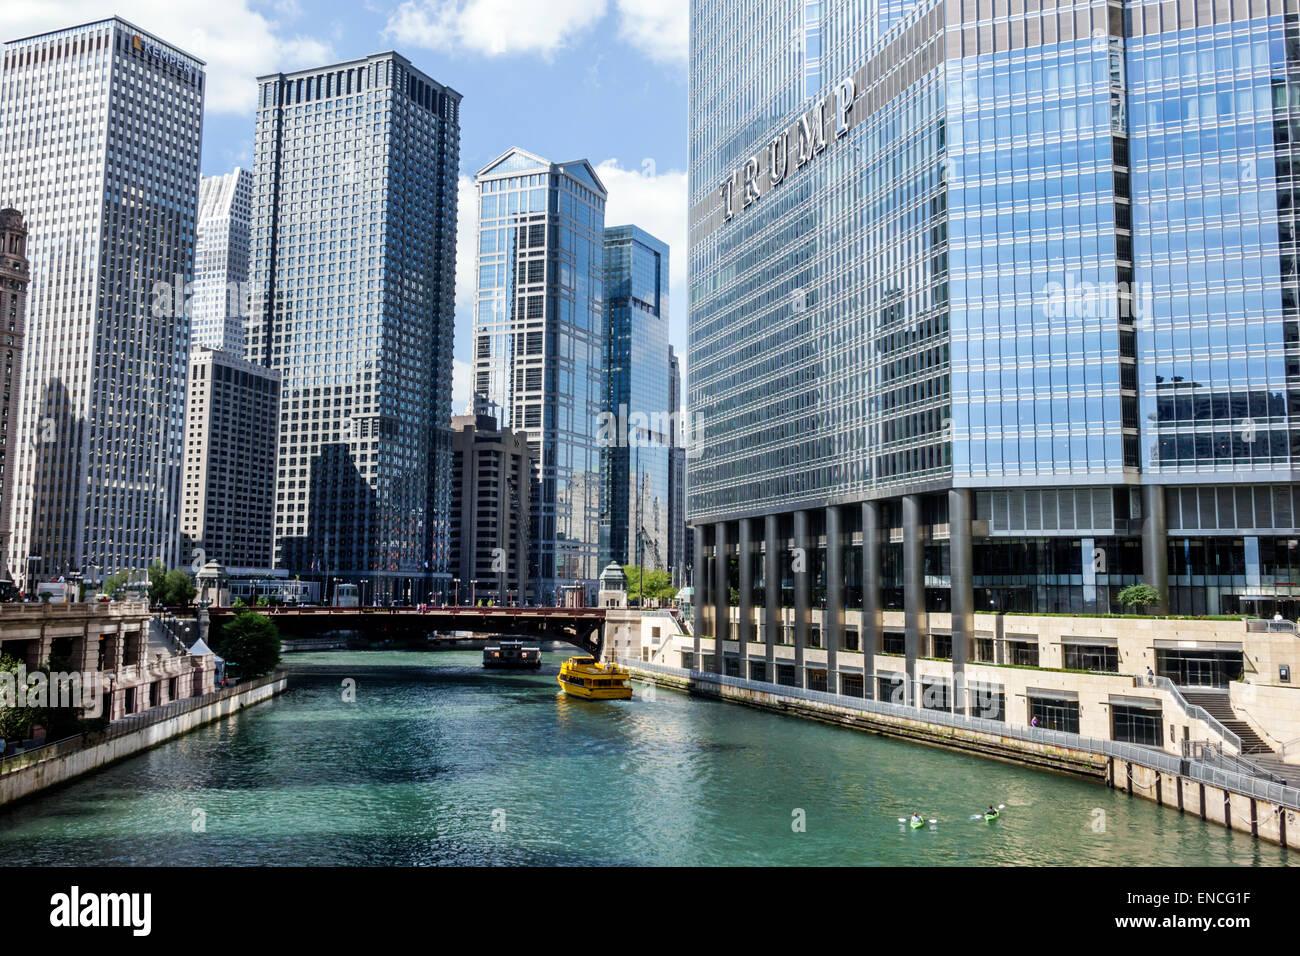 Chicago illinois michigan avenue chicago river skyline skyscraper trump international hotel tower luxury hotel leo burnett building modernist archit